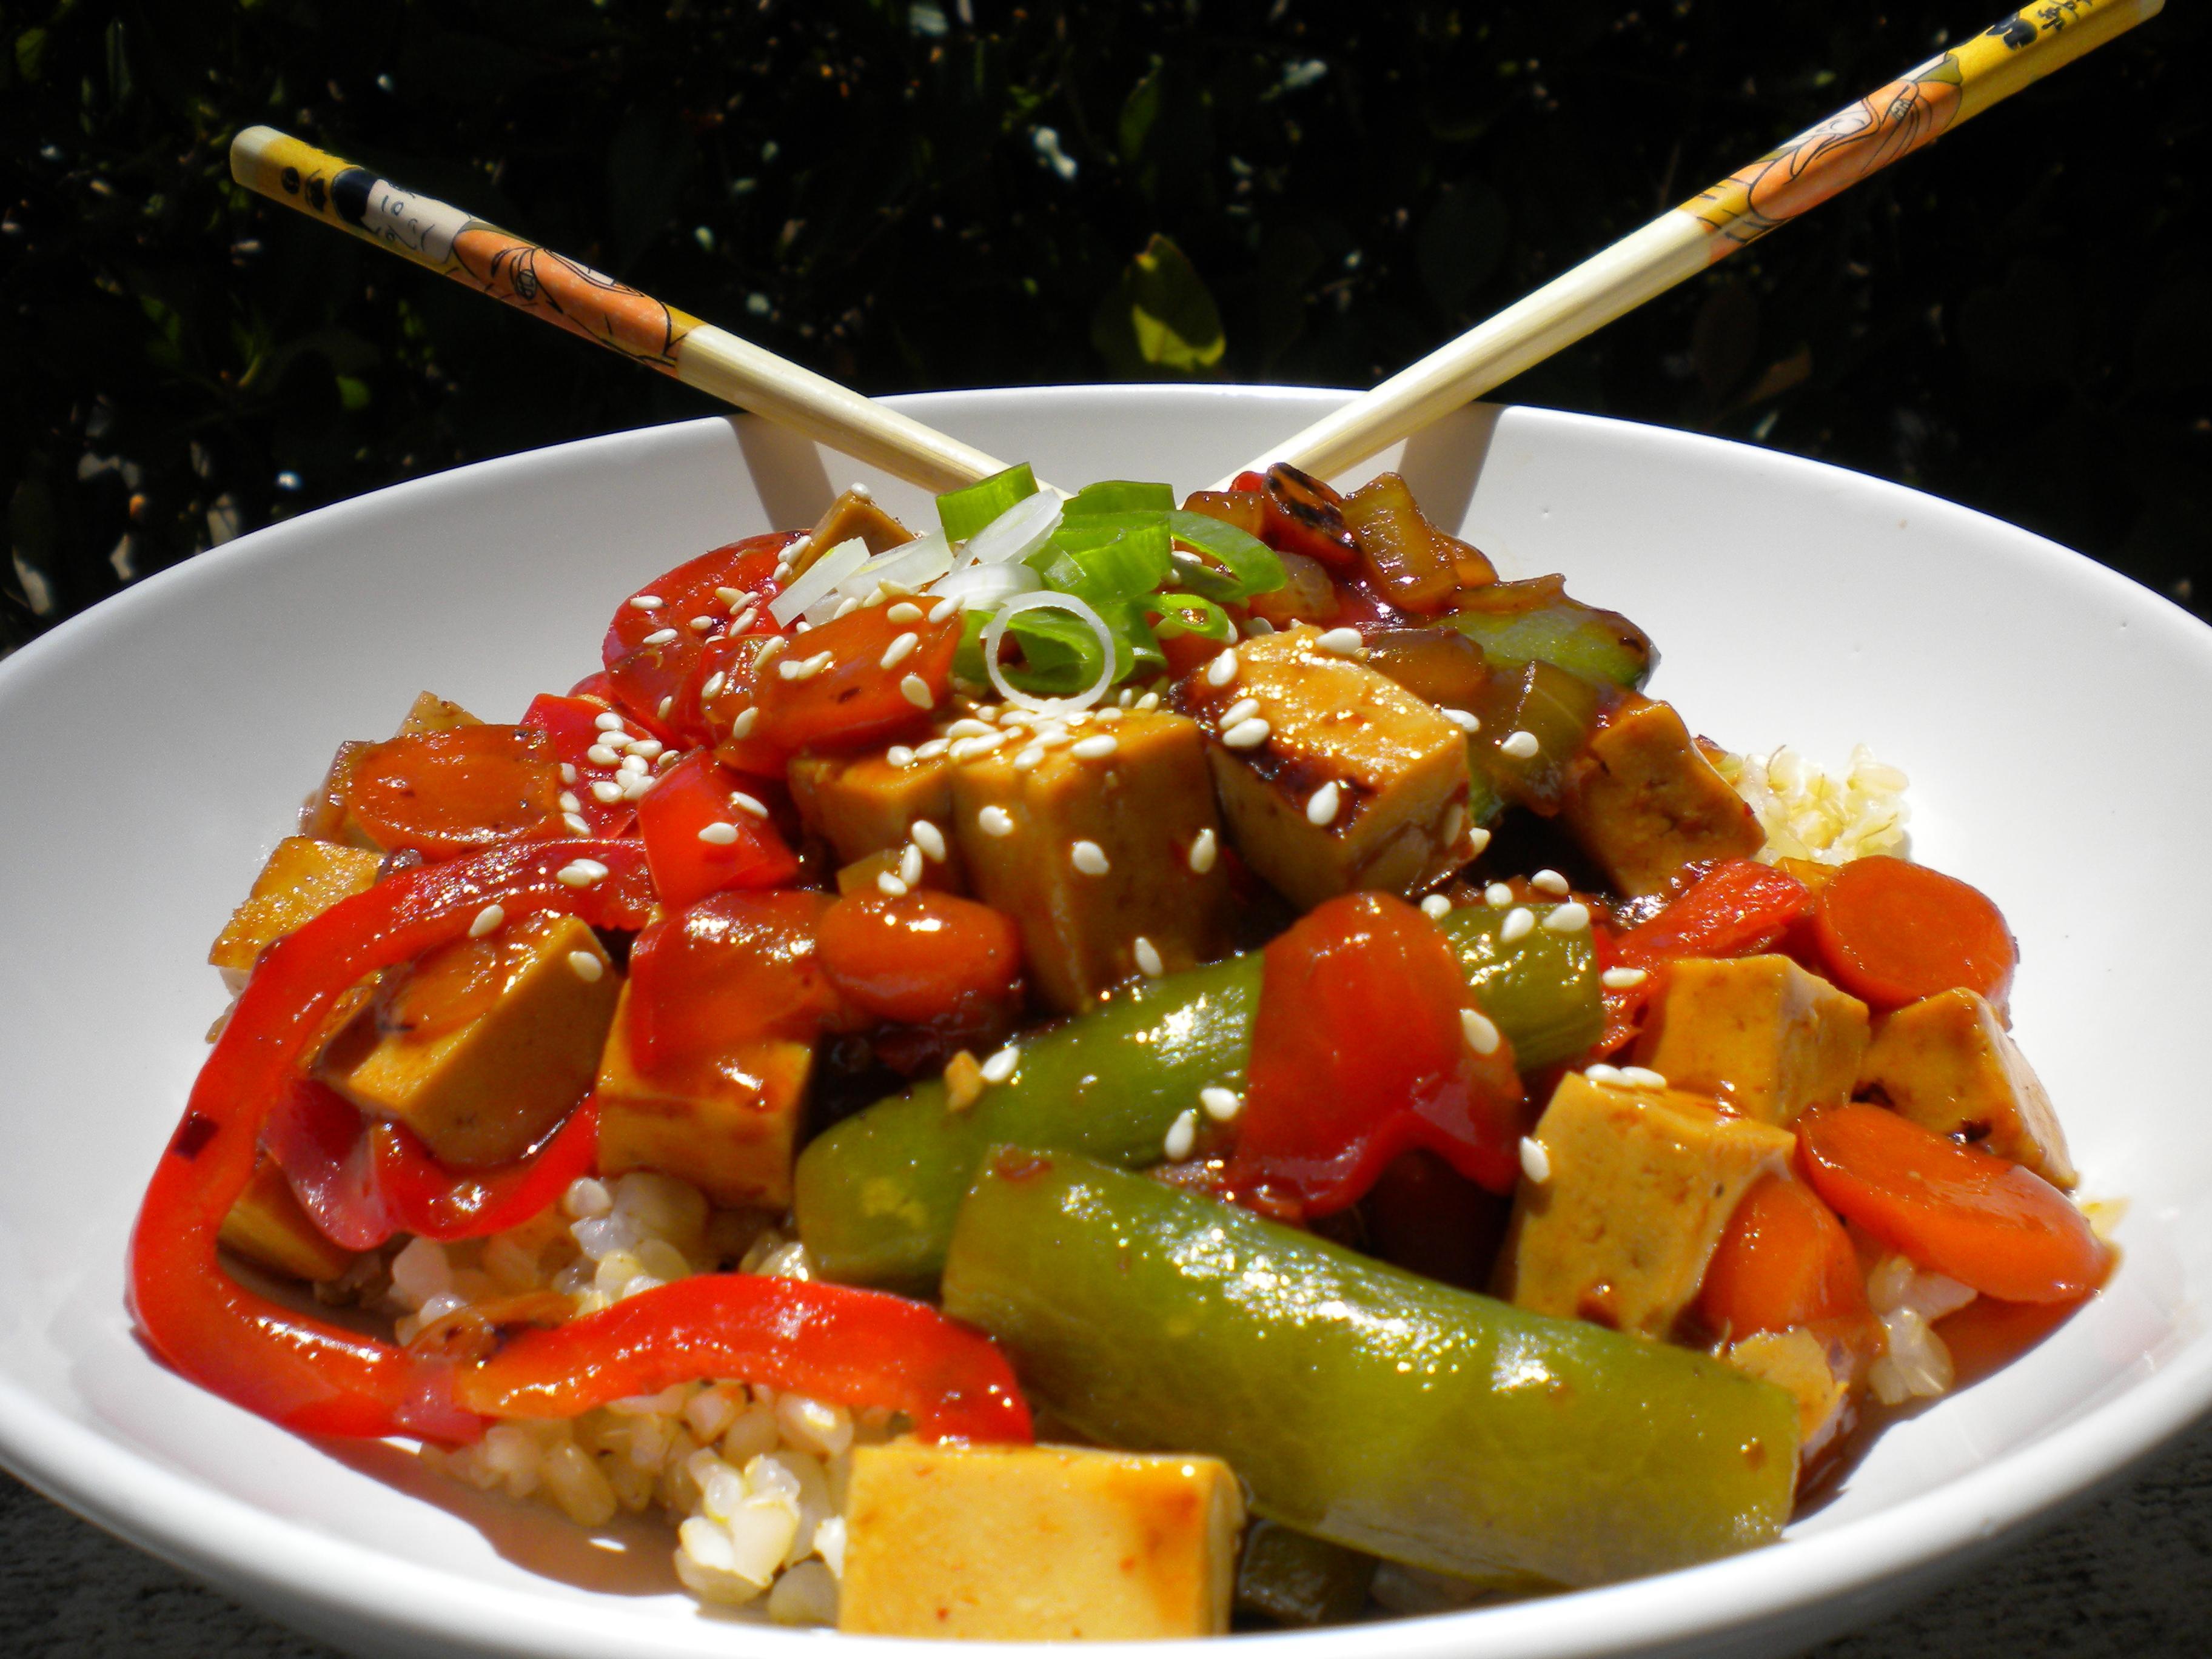 Kumquat's Spicy Oriental Stir-Fry